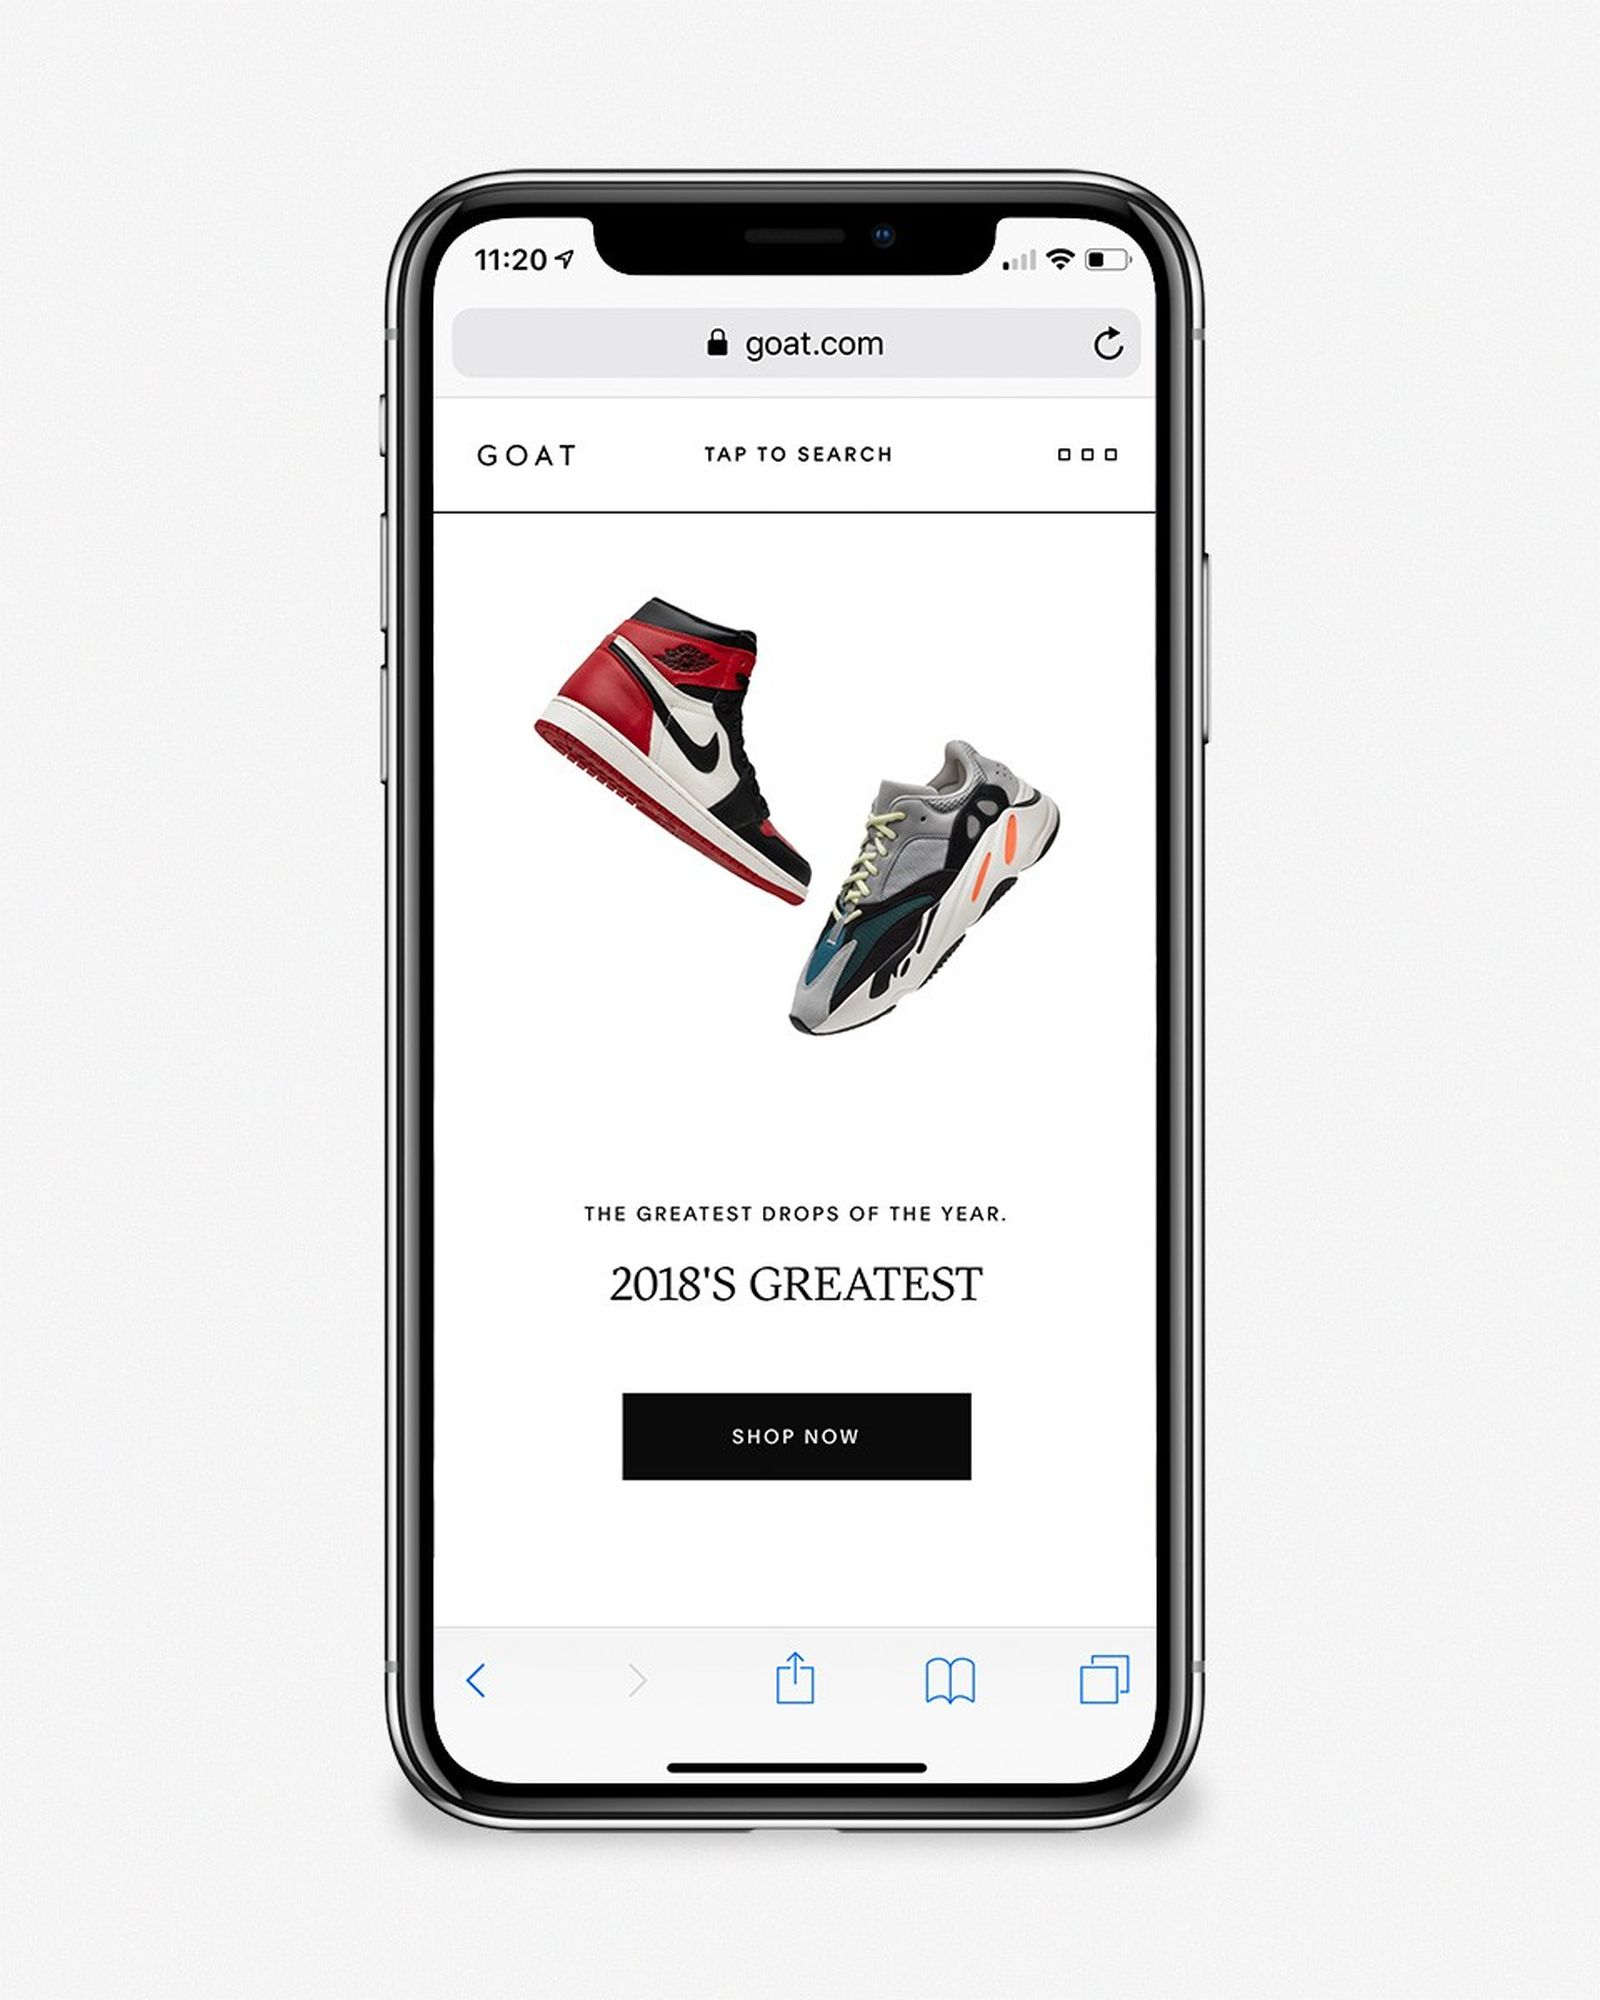 sneaker reselling sites roundup goat Flight Club stadium goods